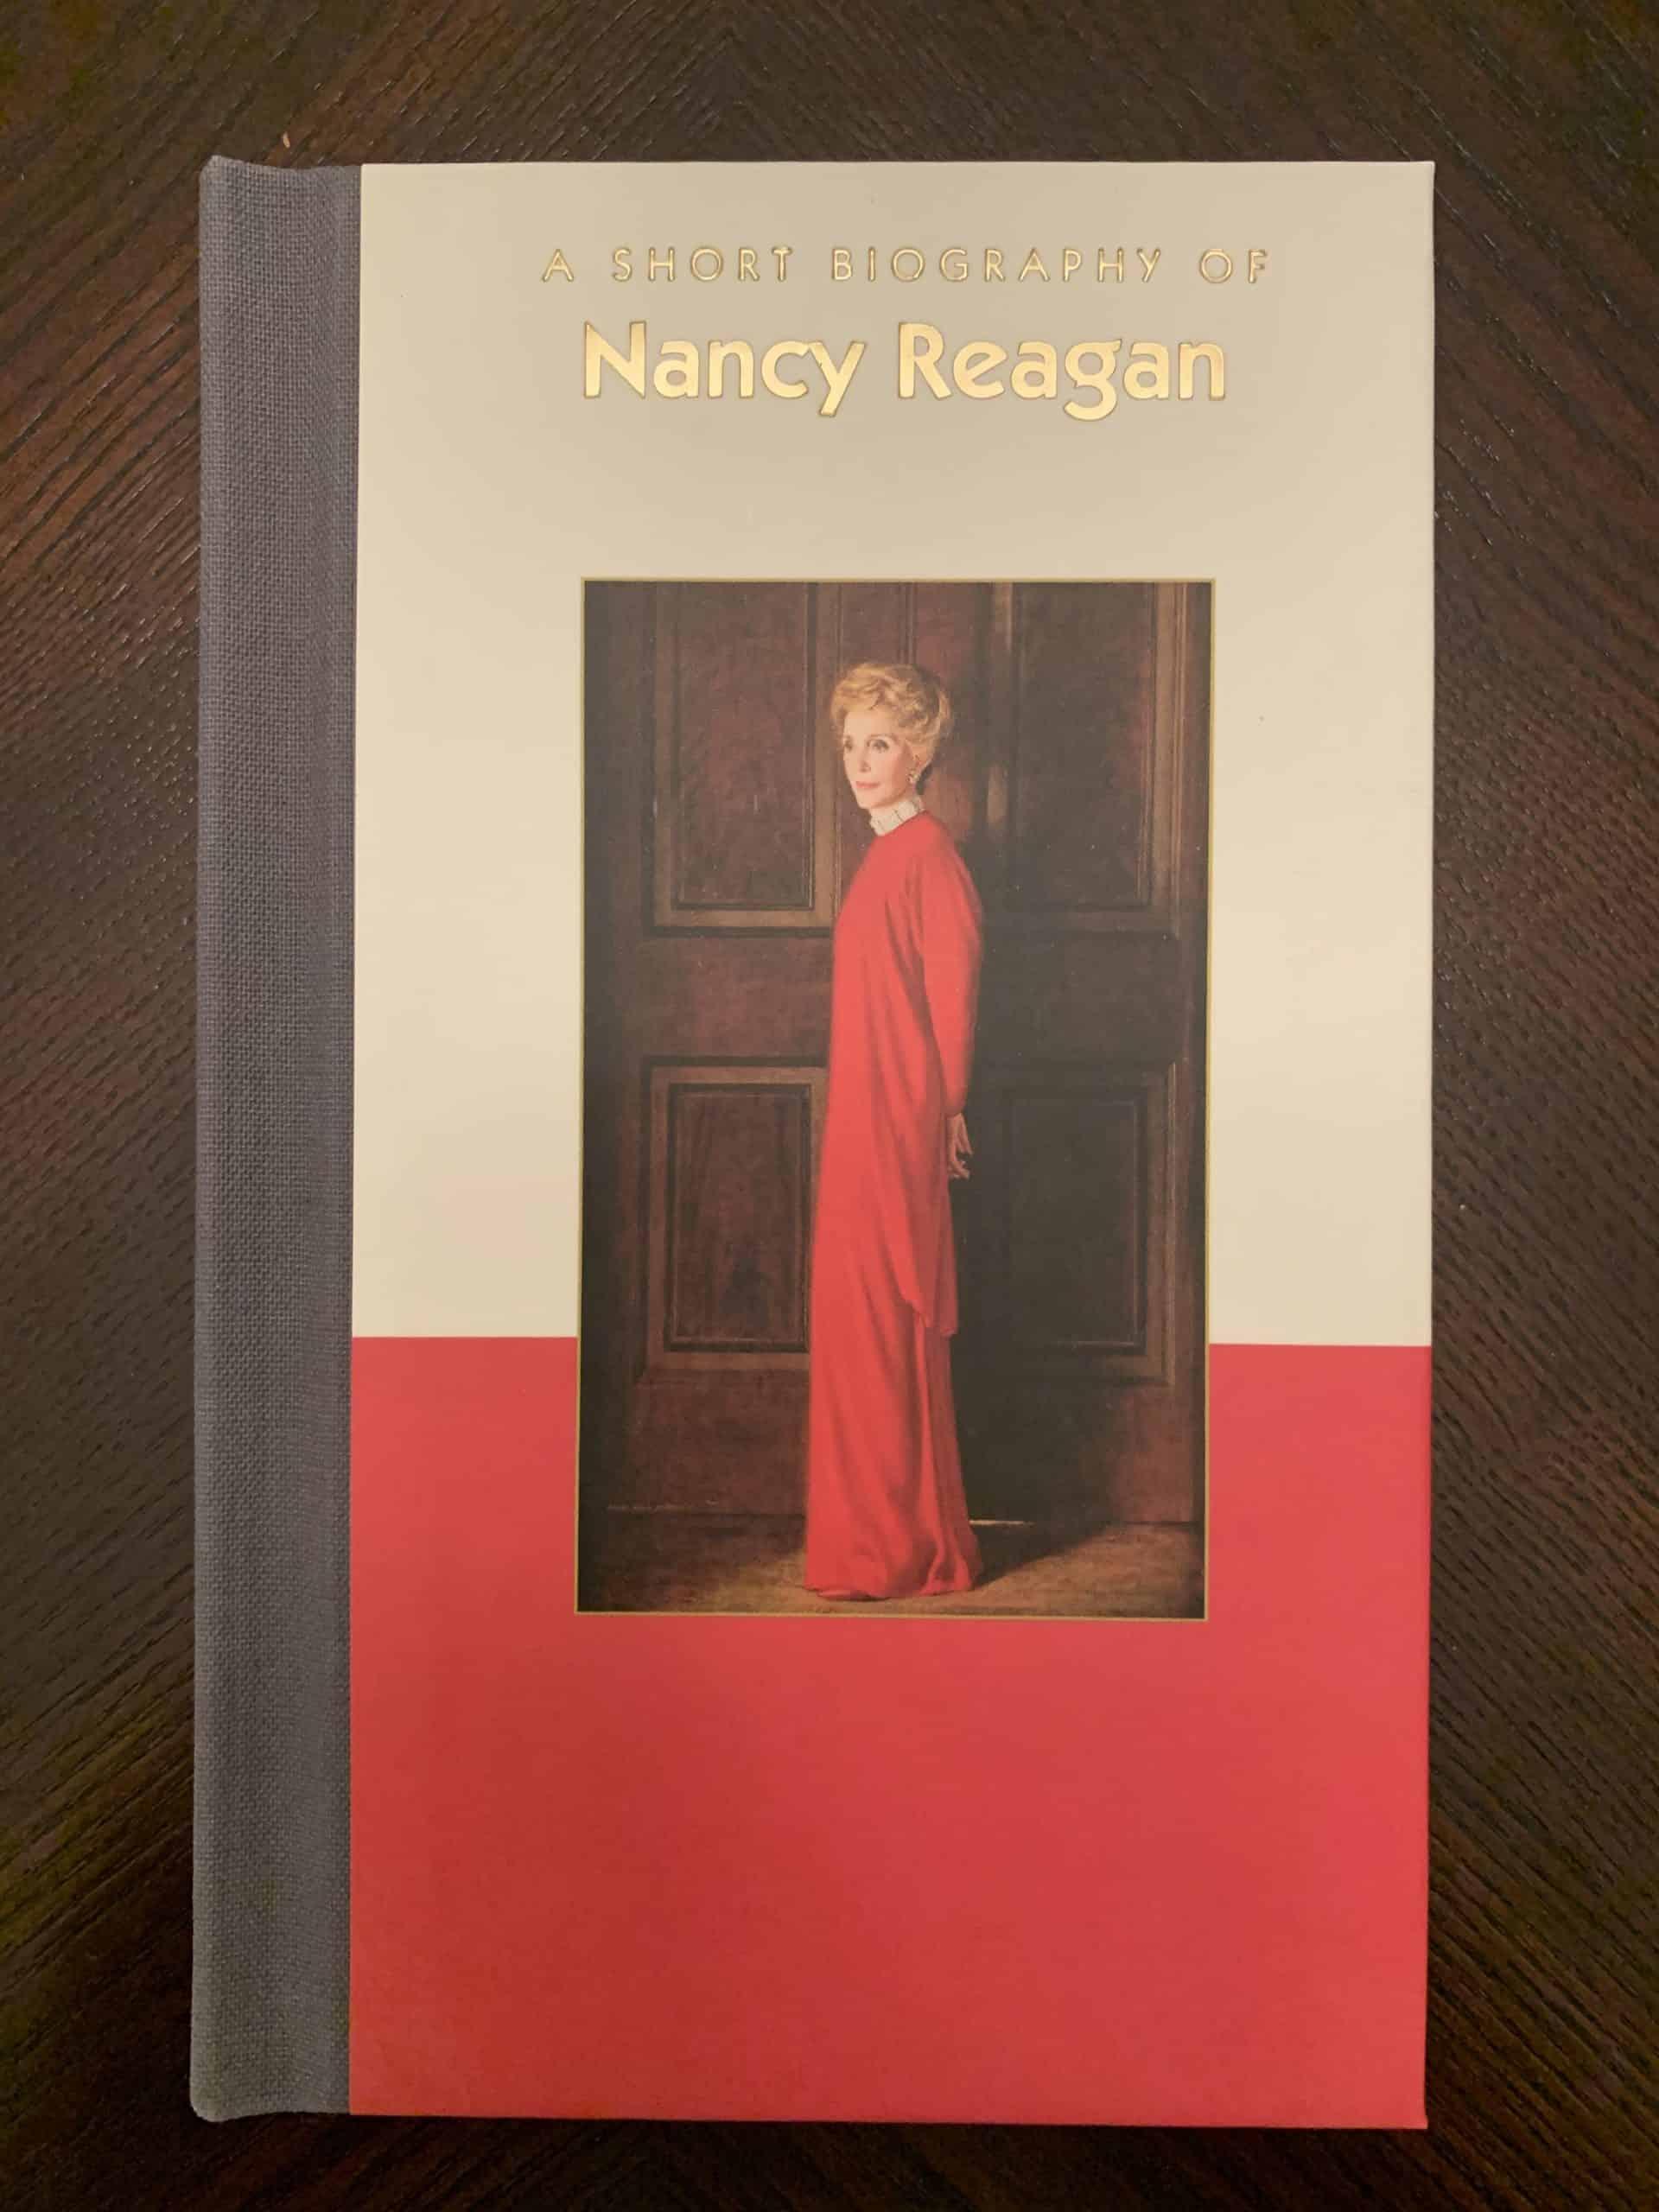 A Short Biography of Nancy Reagan